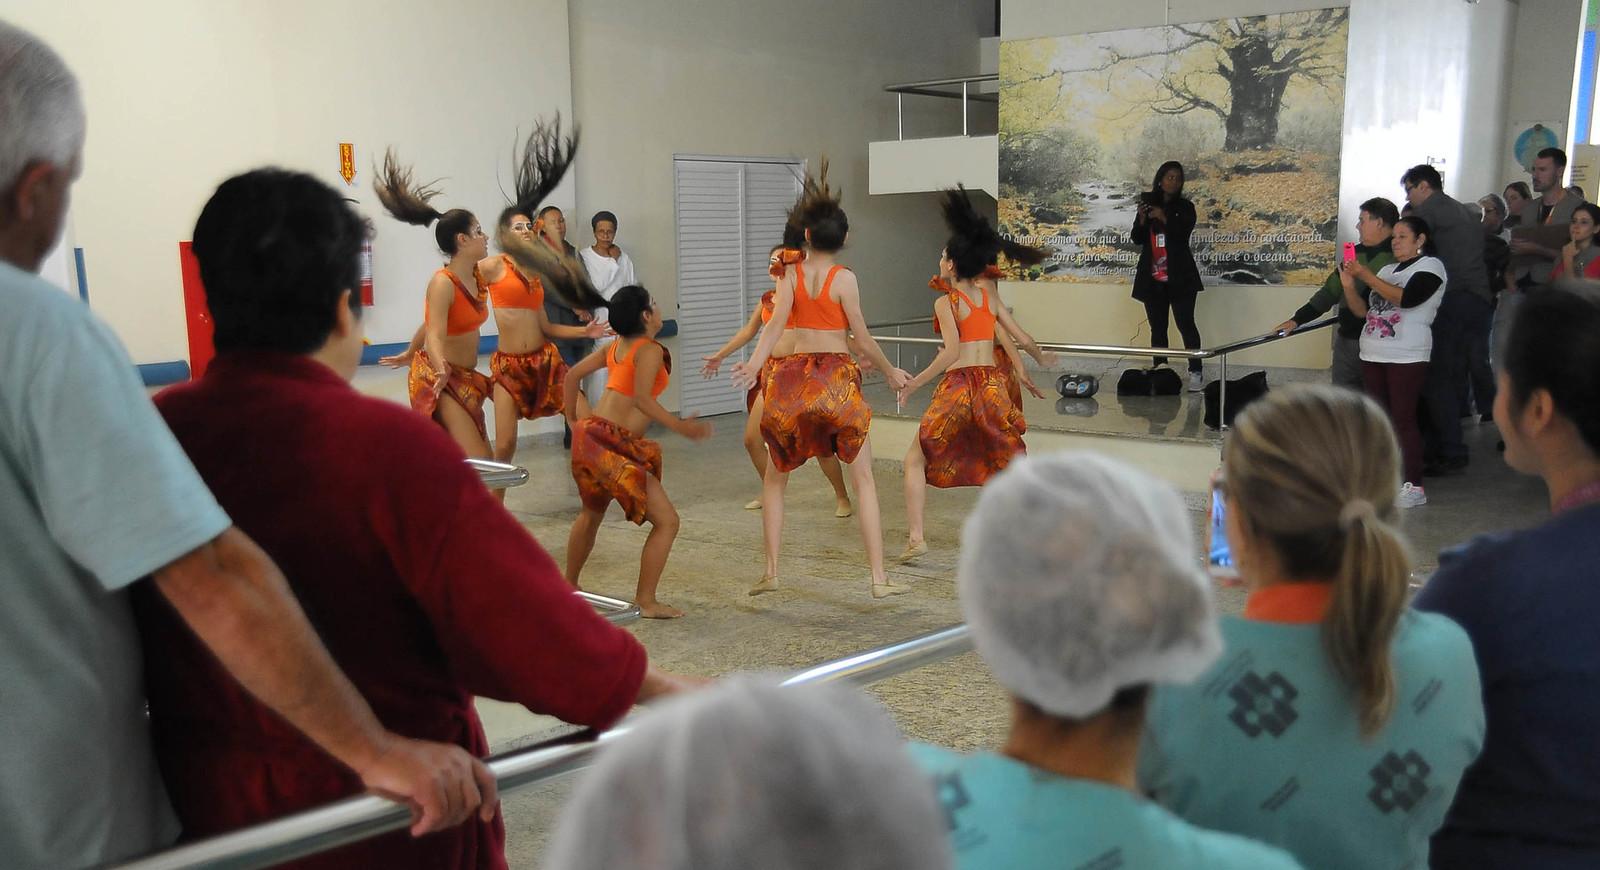 Visitas aos Hospitais - 35º Festival de Dança de Joinville